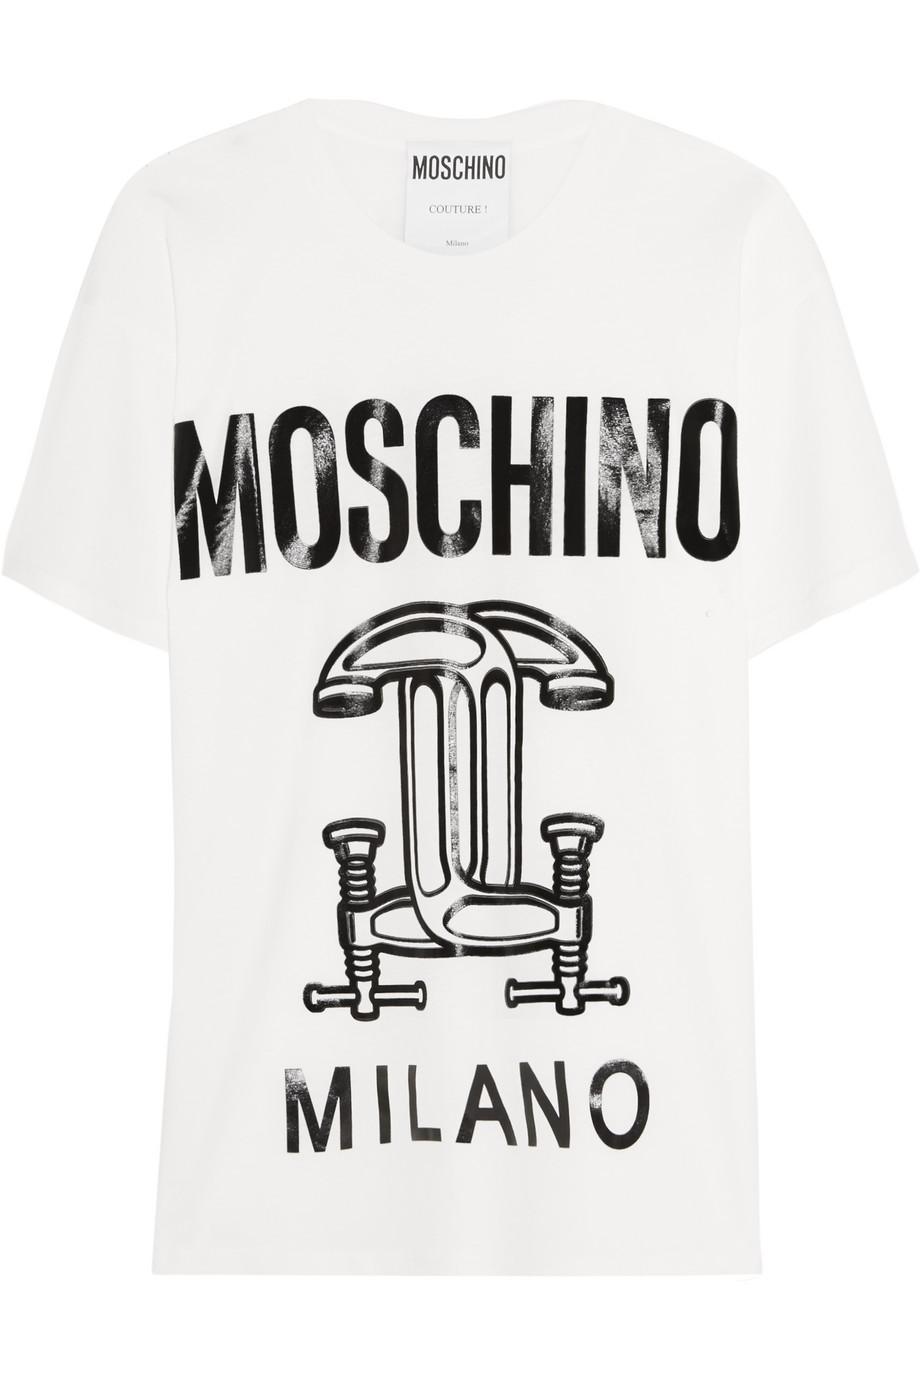 Moschino Printed Cotton-Jersey T-Shirt, White, Women's